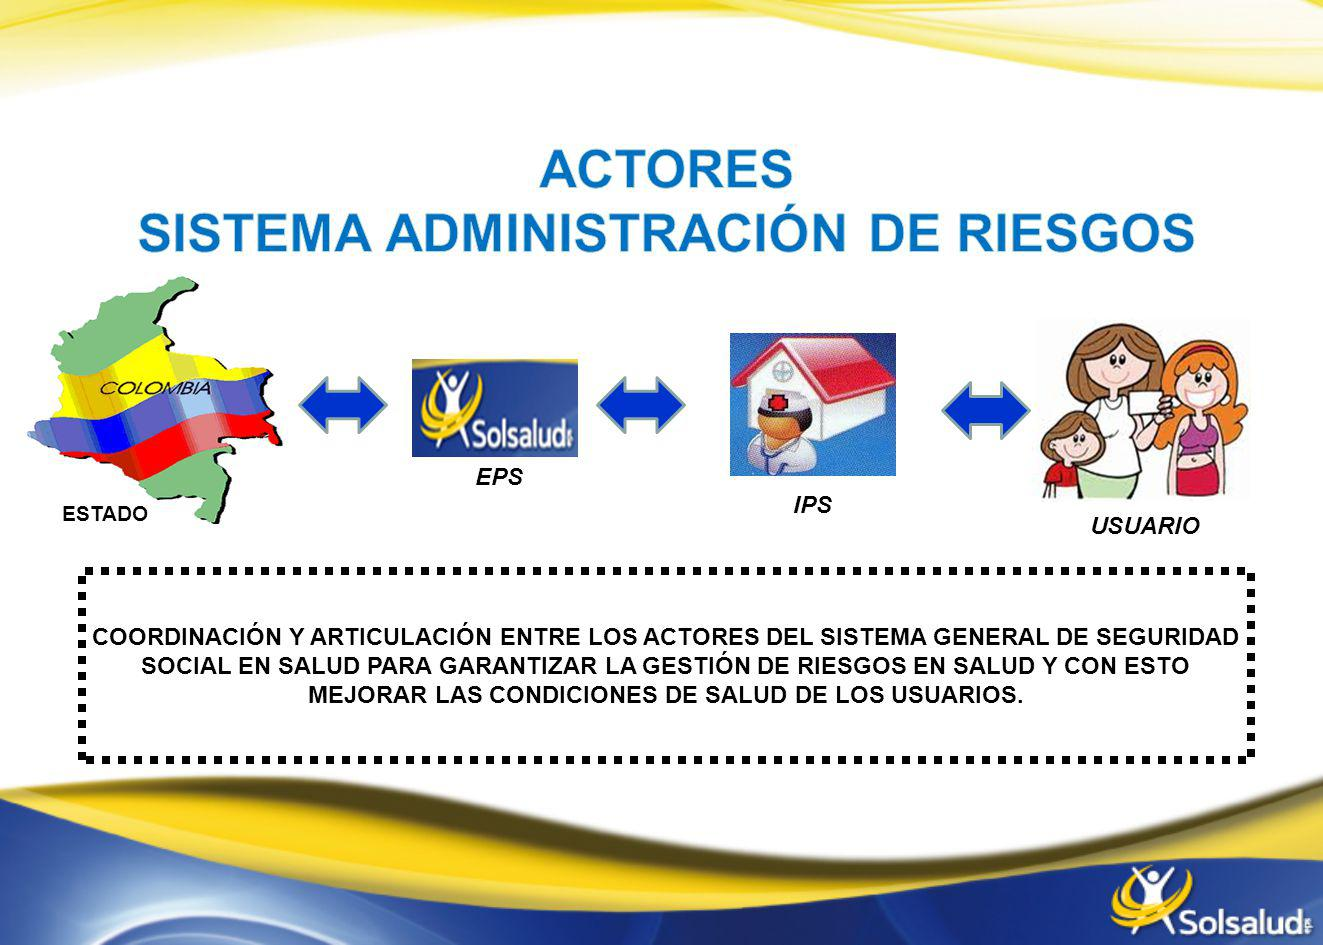 SISTEMA ADMINISTRACIÓN DE RIESGOS